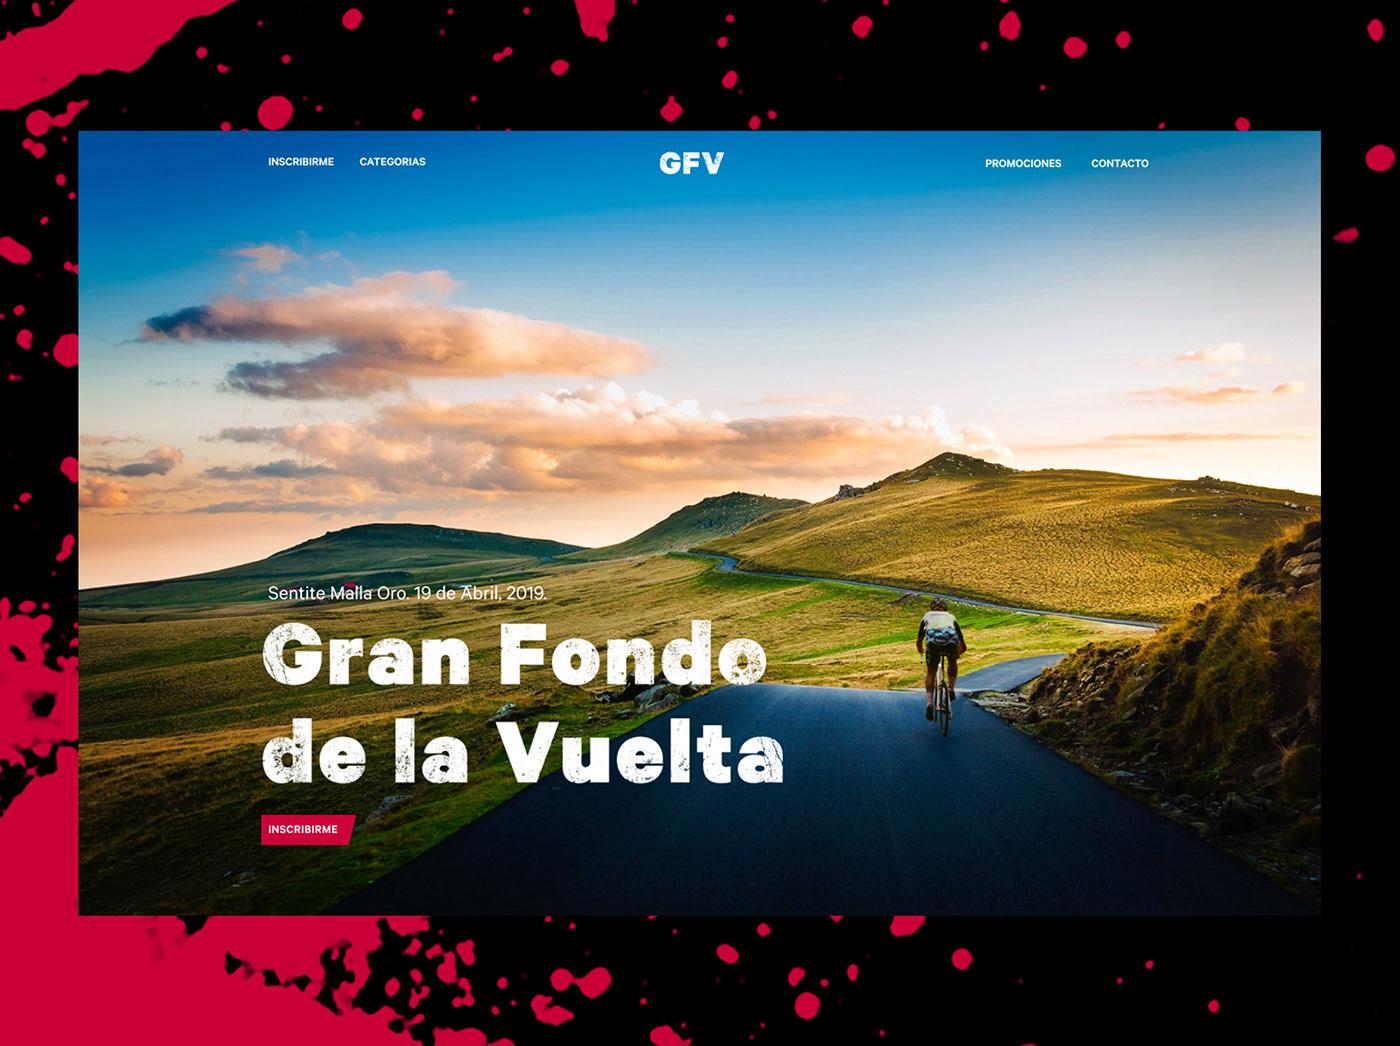 Web sport Bike muddy track